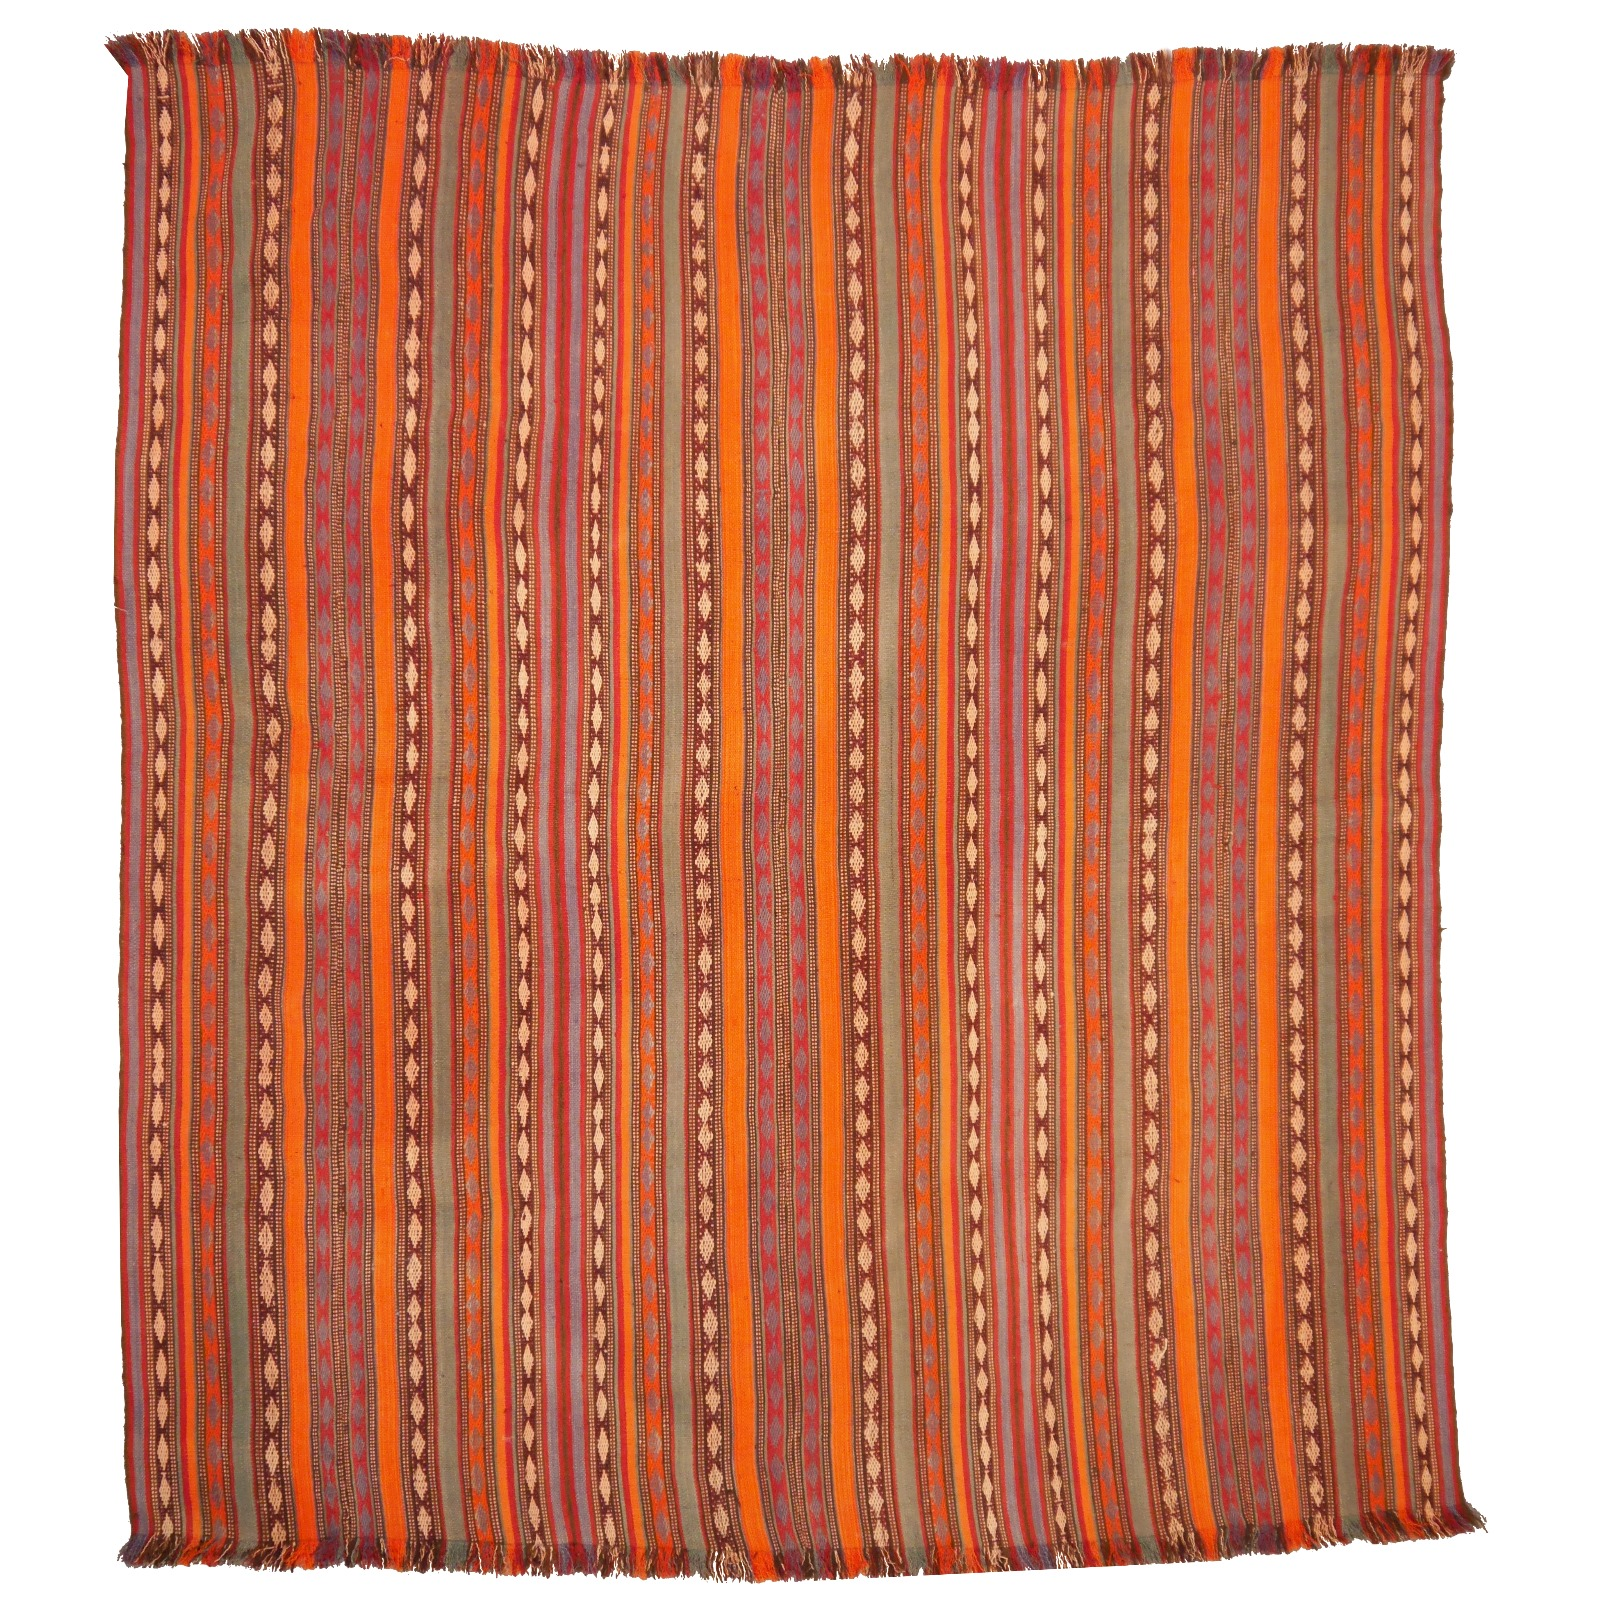 12148 djadjim teppich iran persien 160 x 145 cm. Black Bedroom Furniture Sets. Home Design Ideas